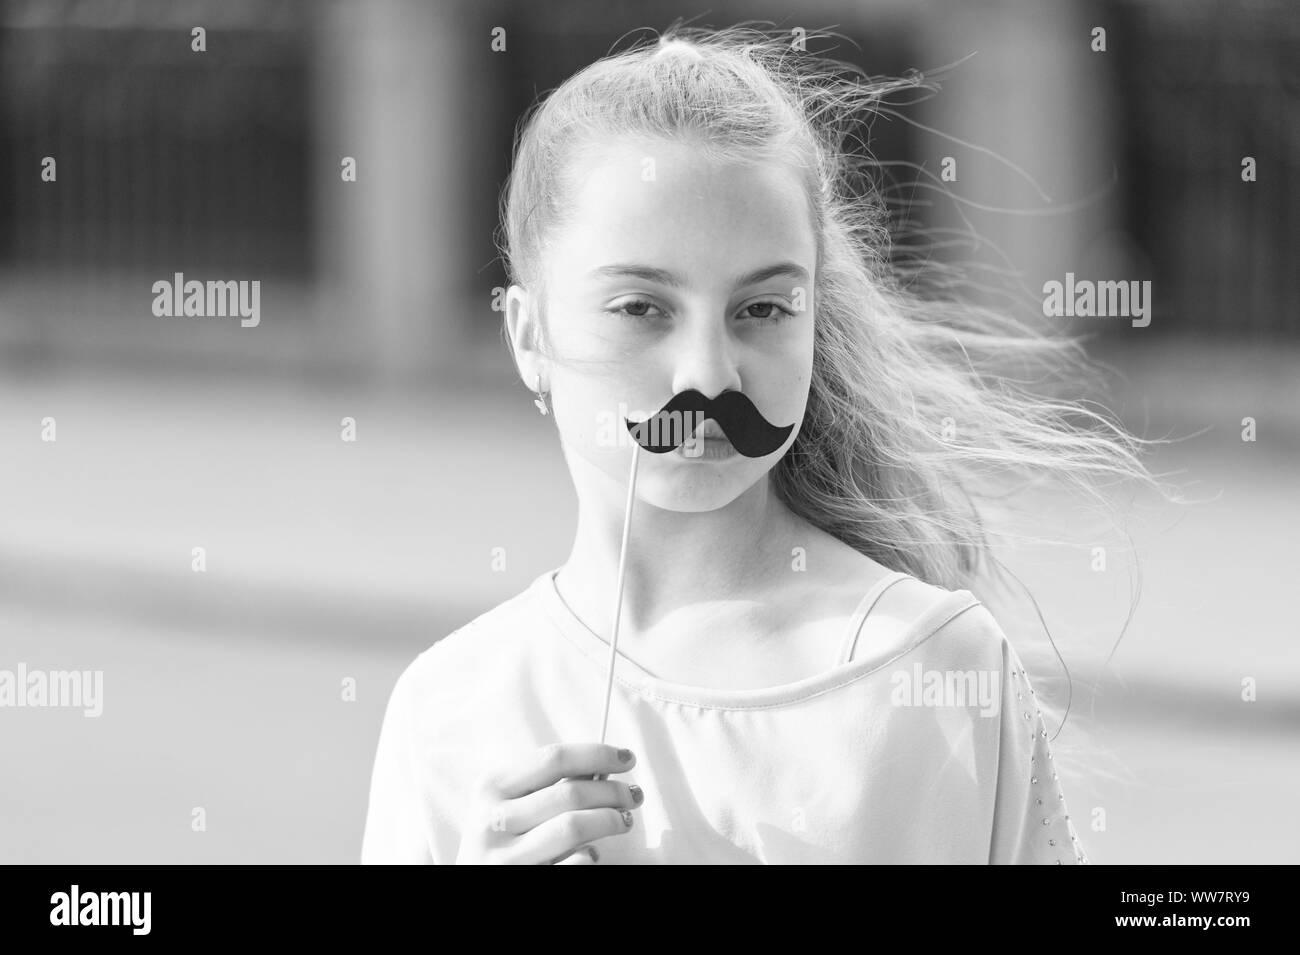 Fake Moustache Black And White Stock Photos Images Alamy